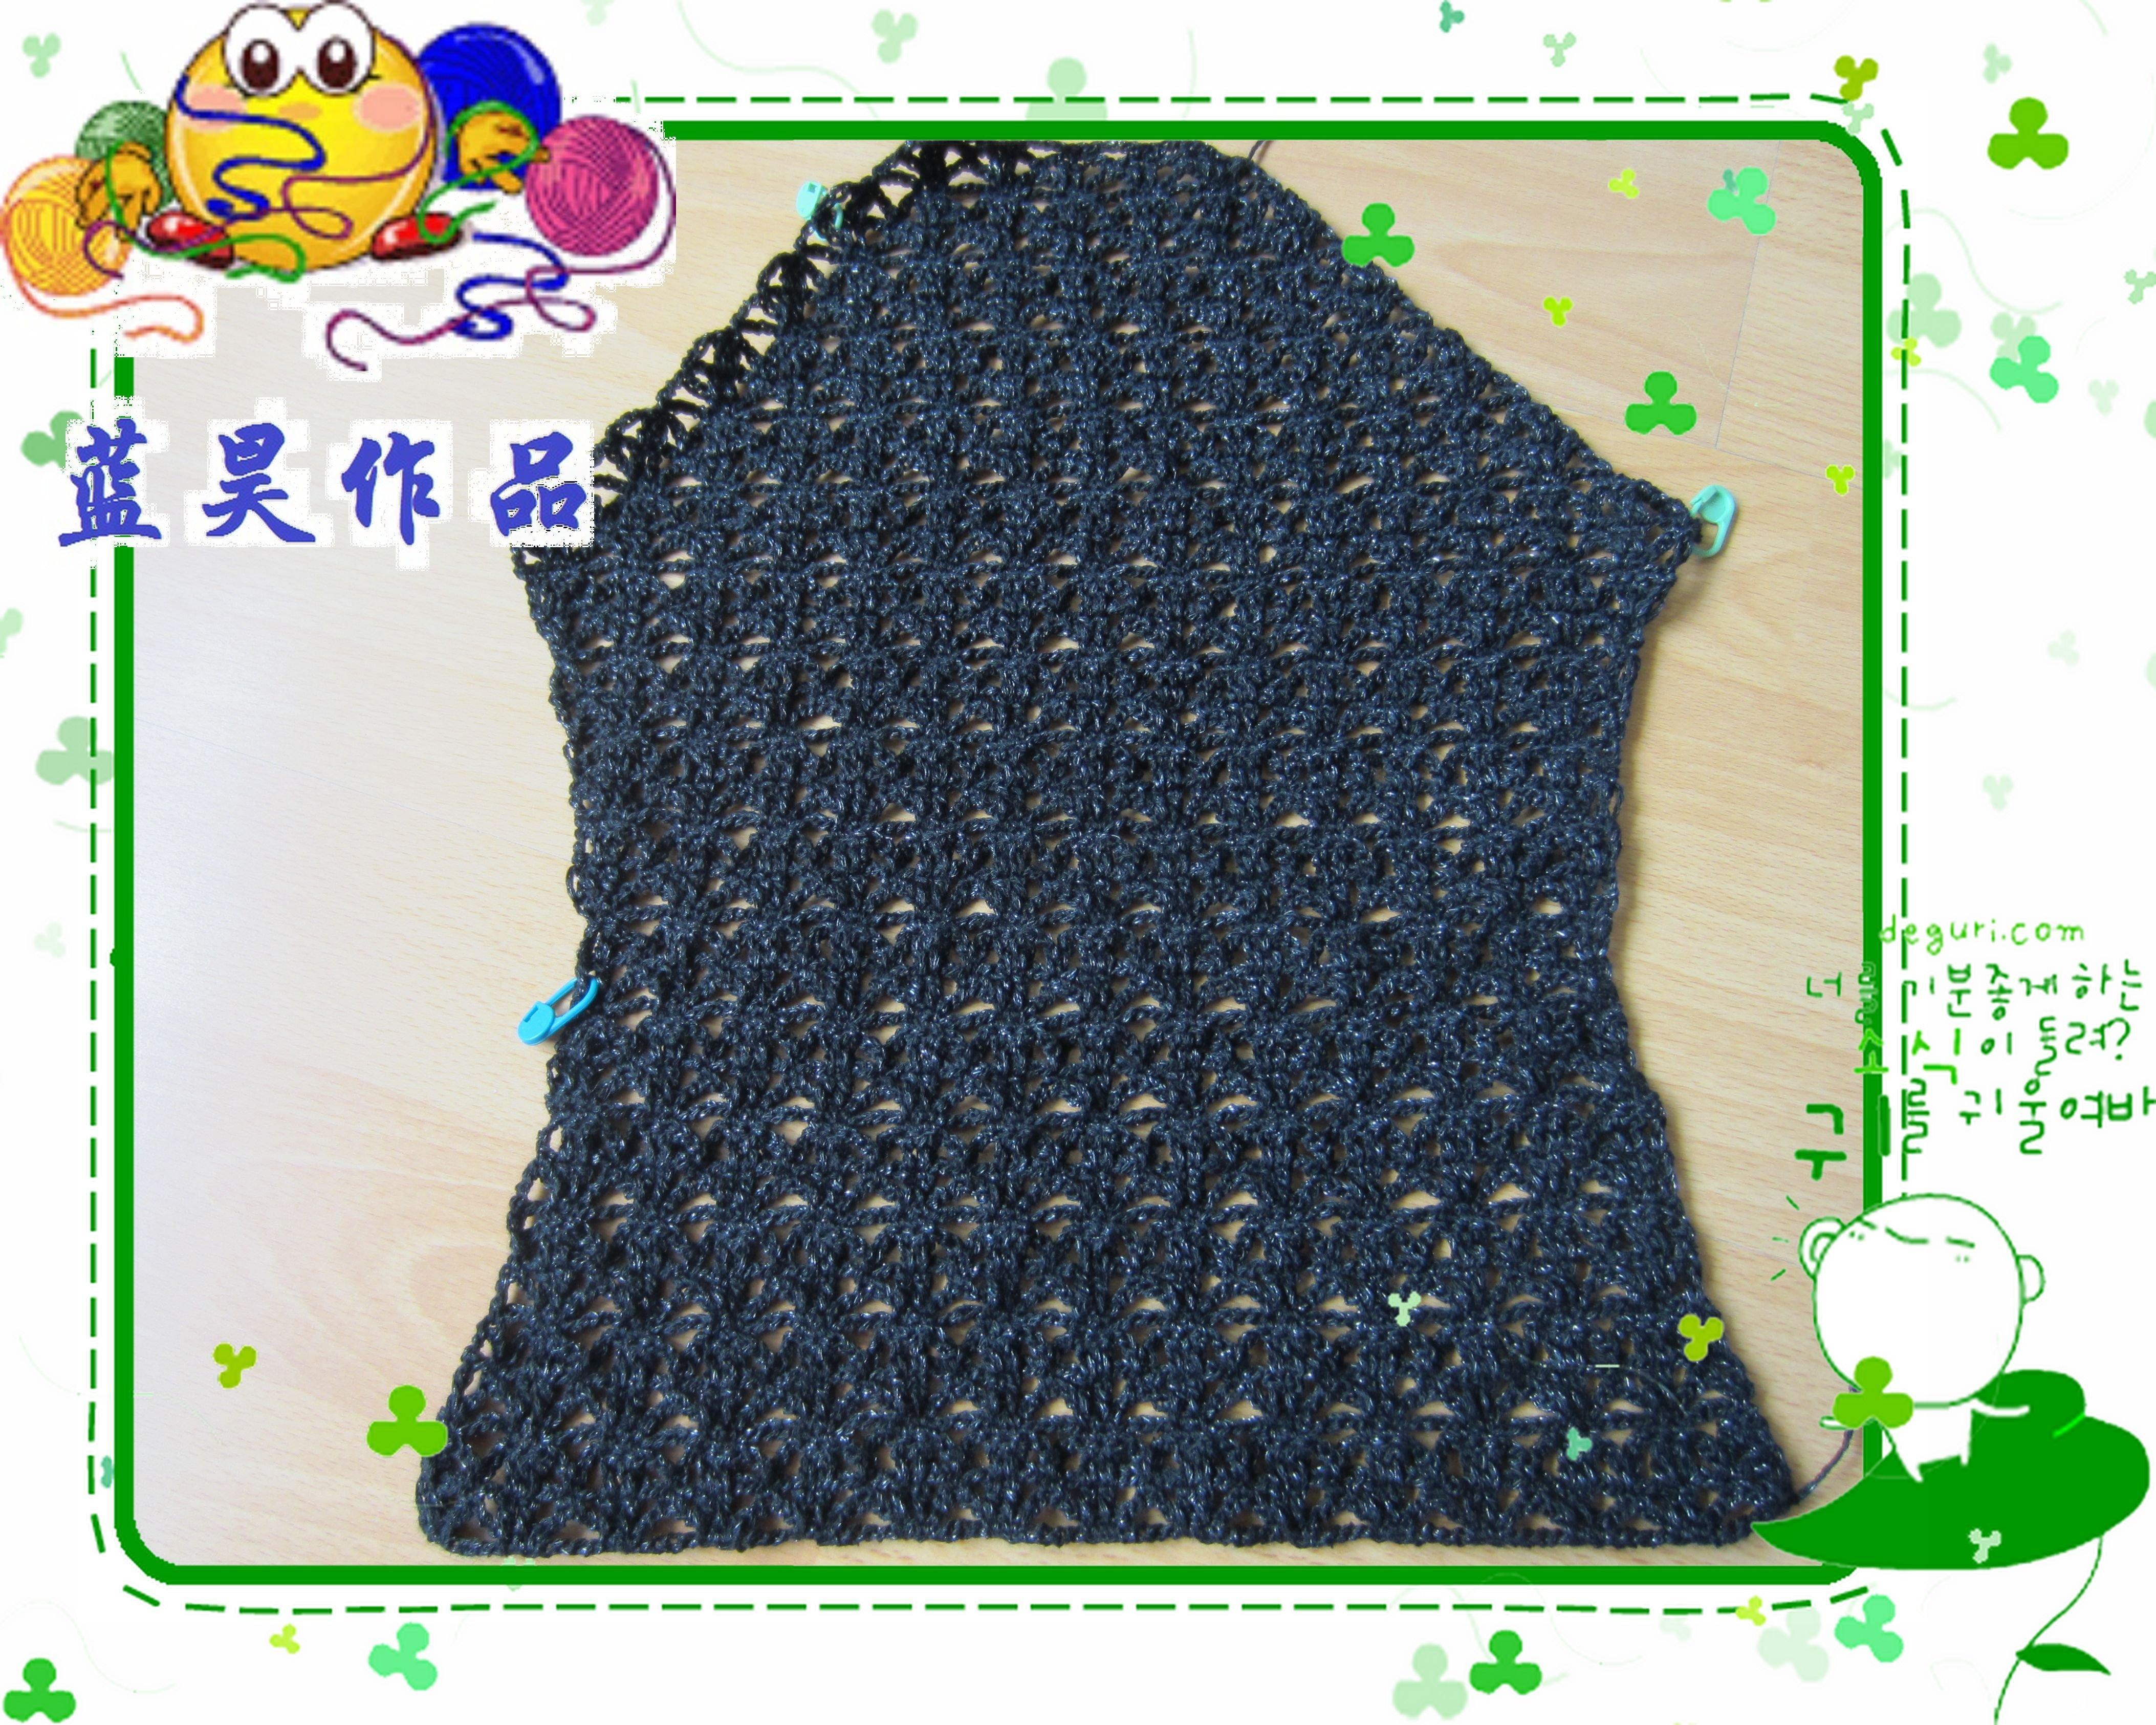 OL开衫1 袖子.jpg